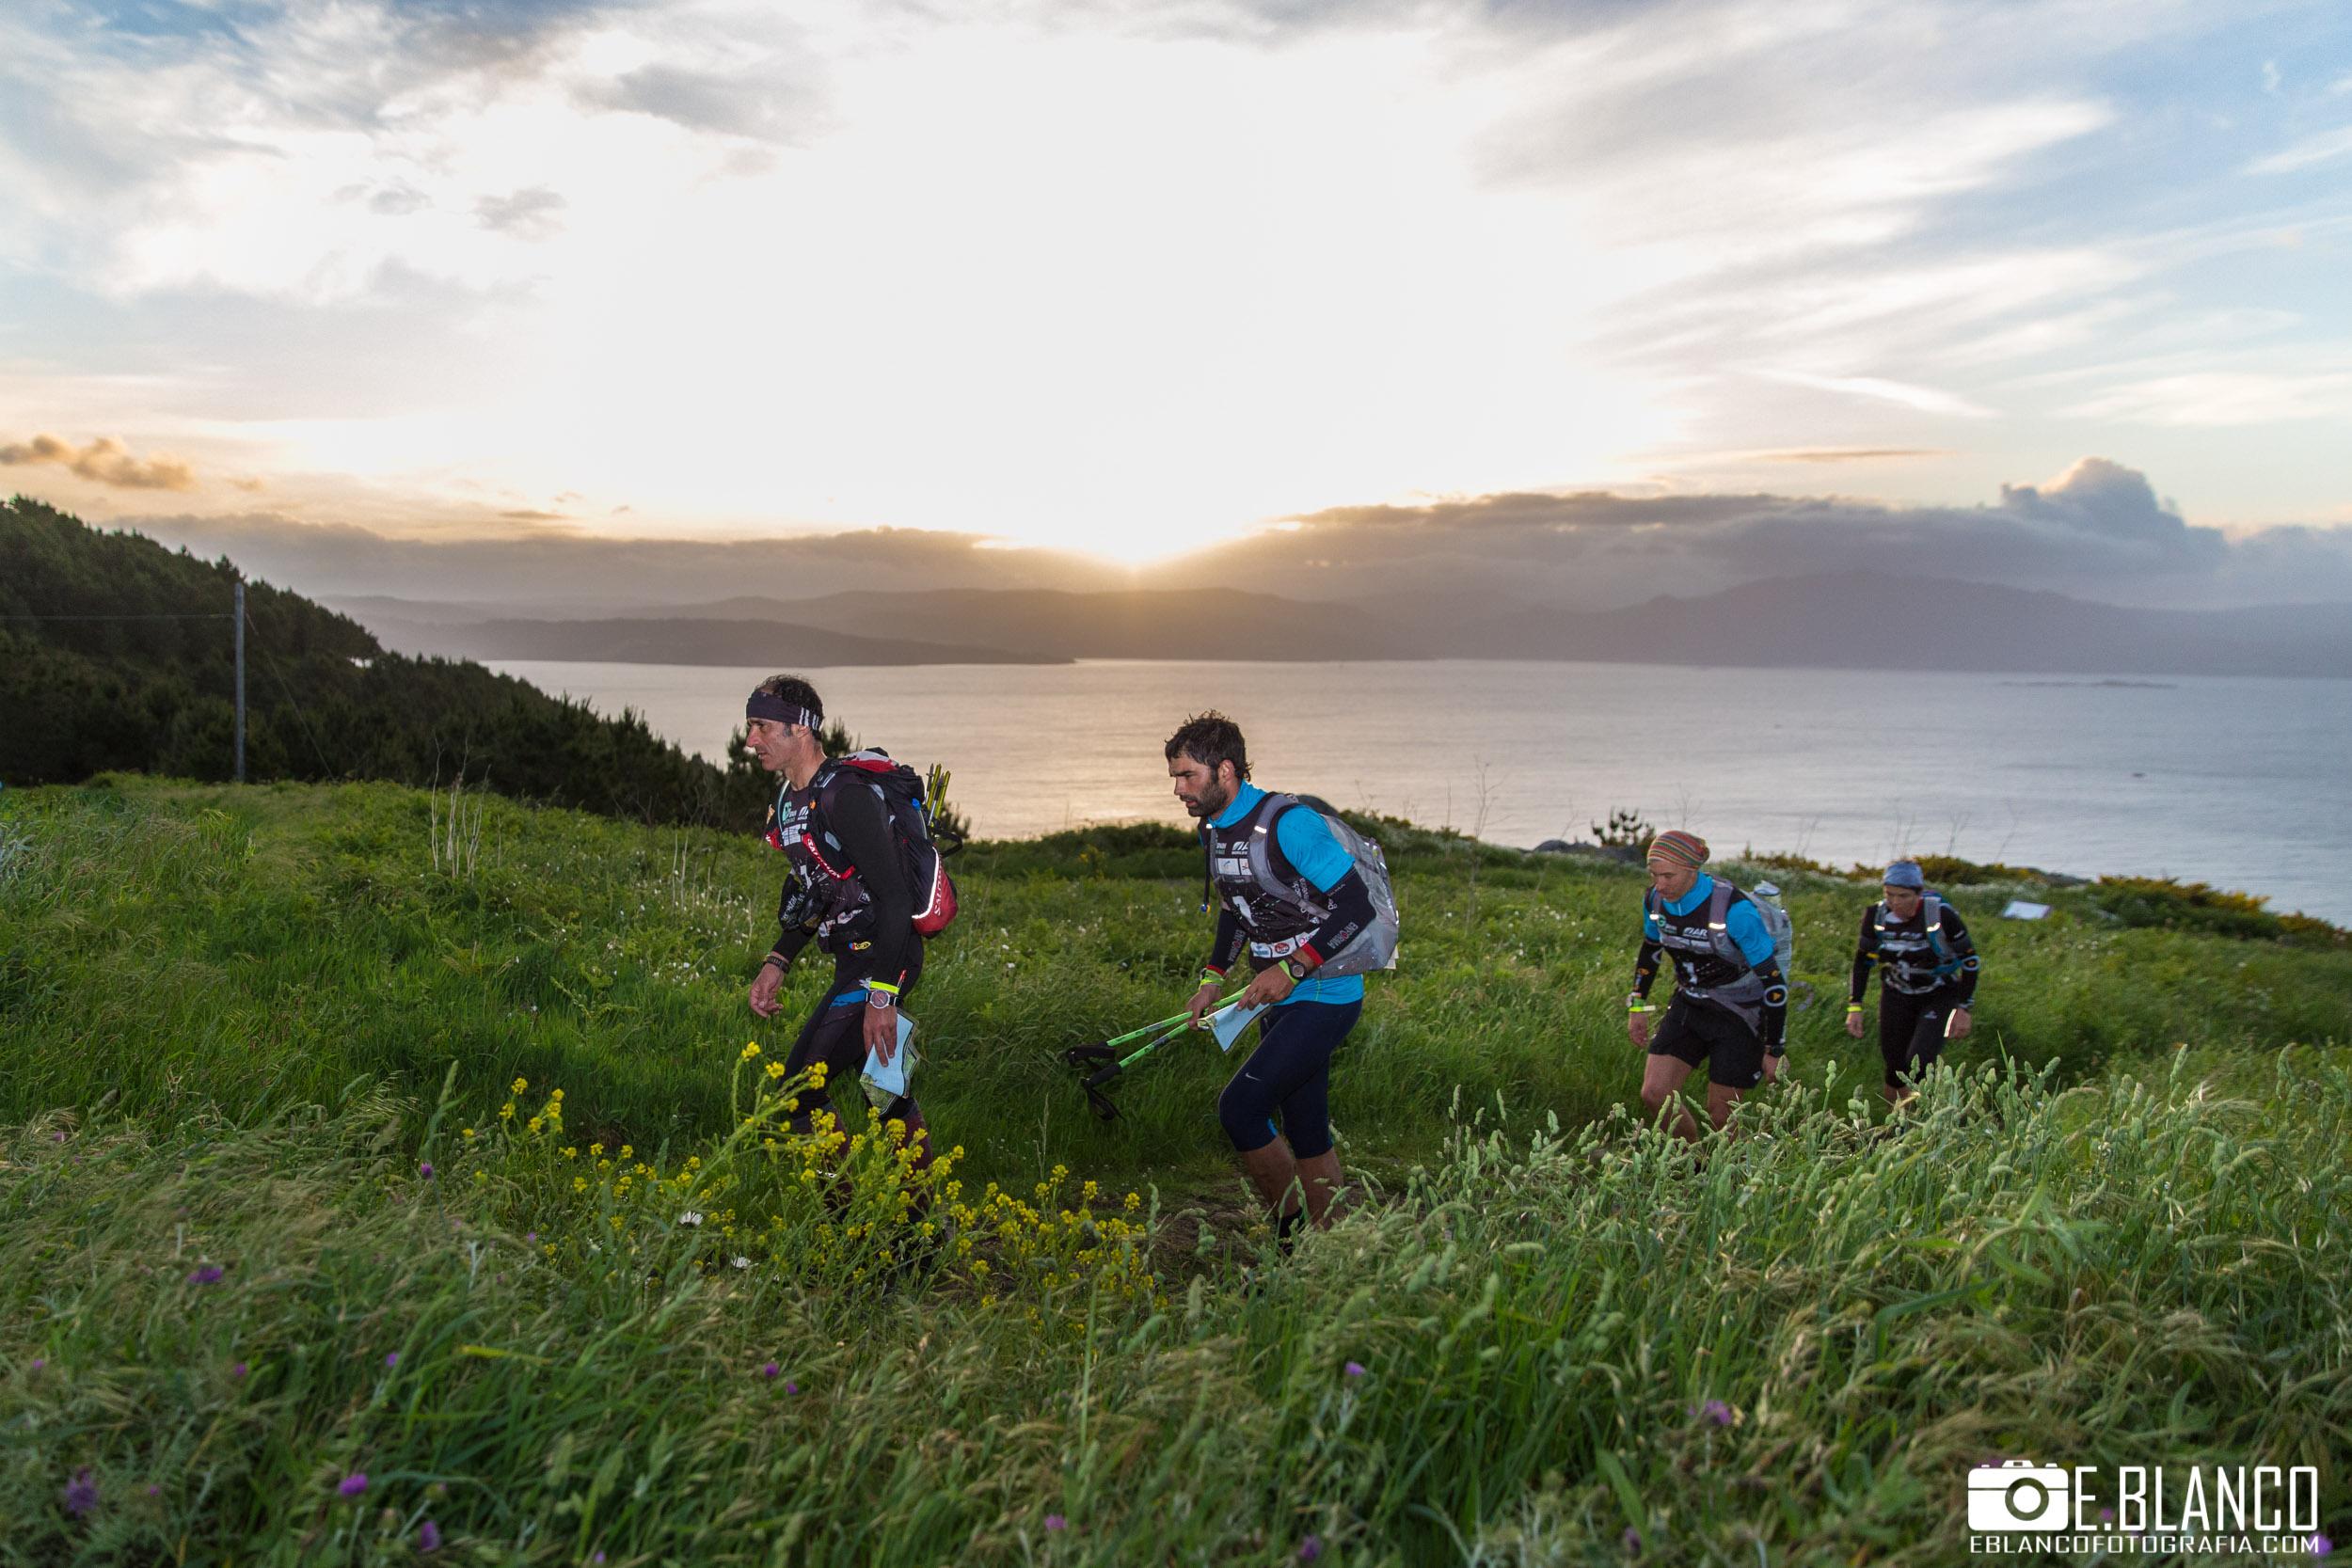 Trekking at Raid Gallaecia